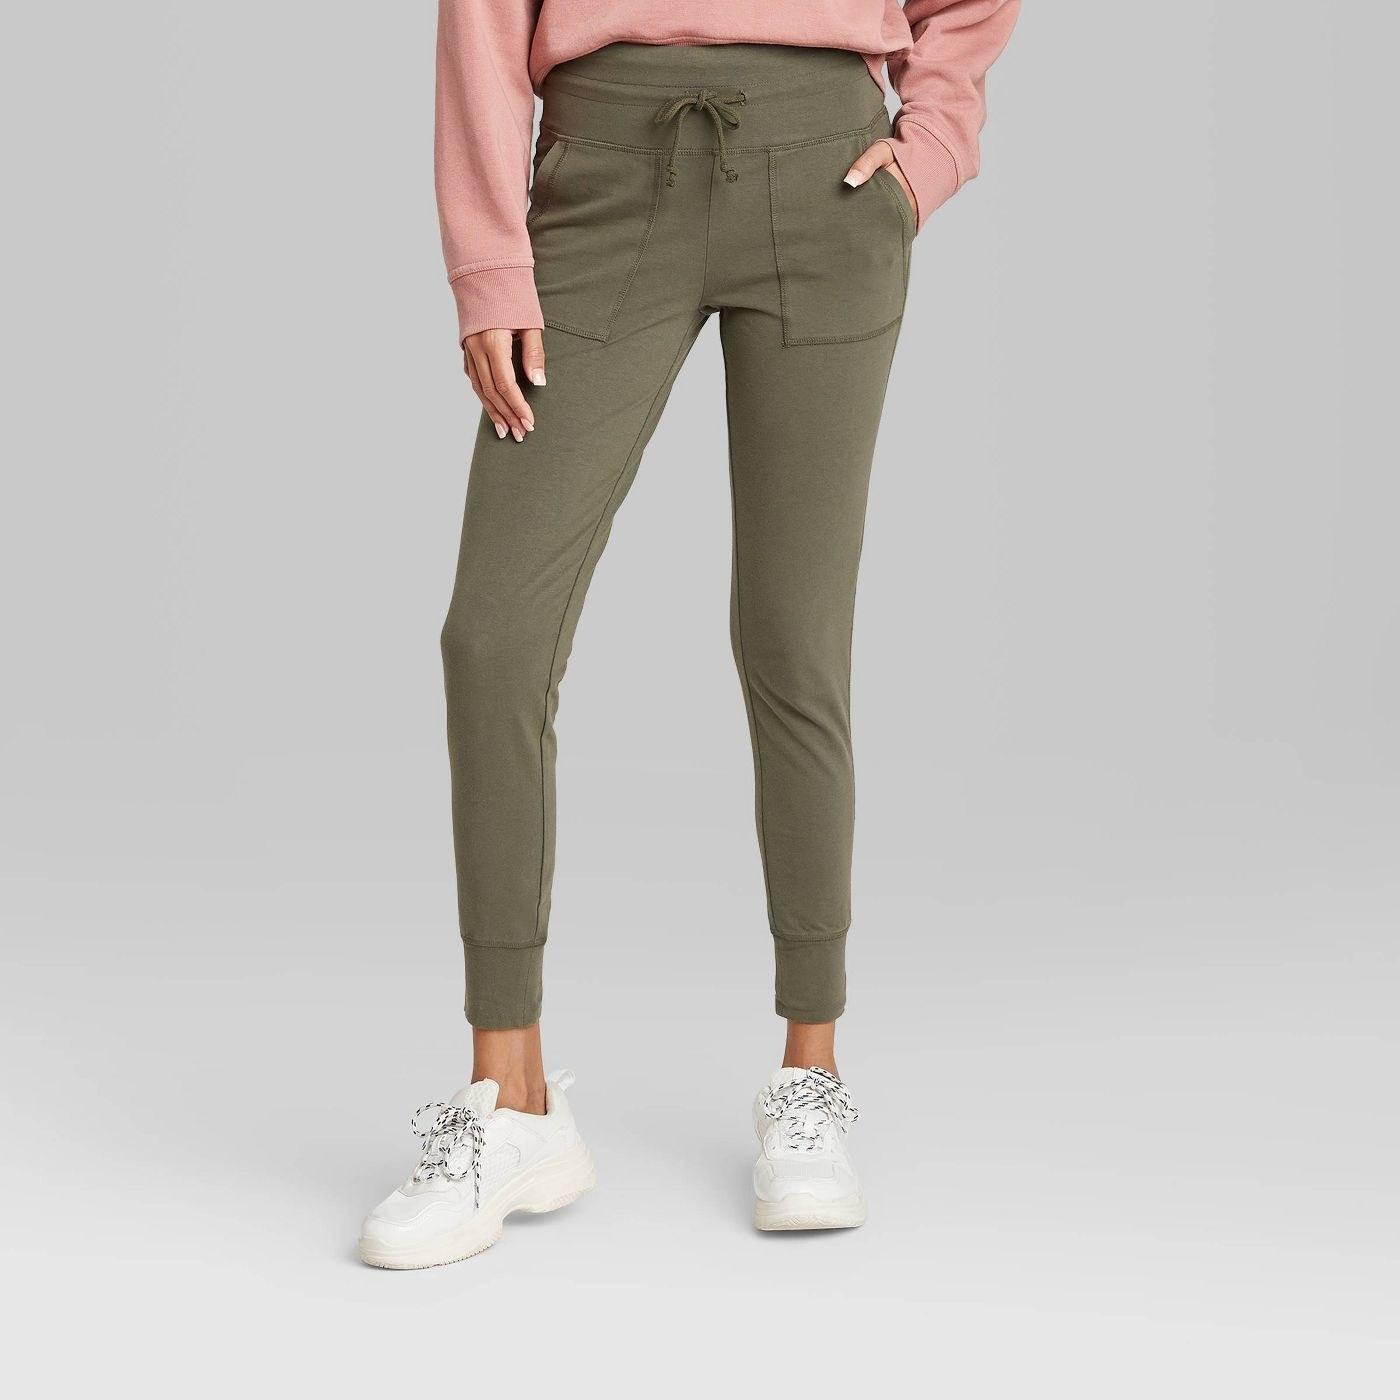 a model wearing green joggers